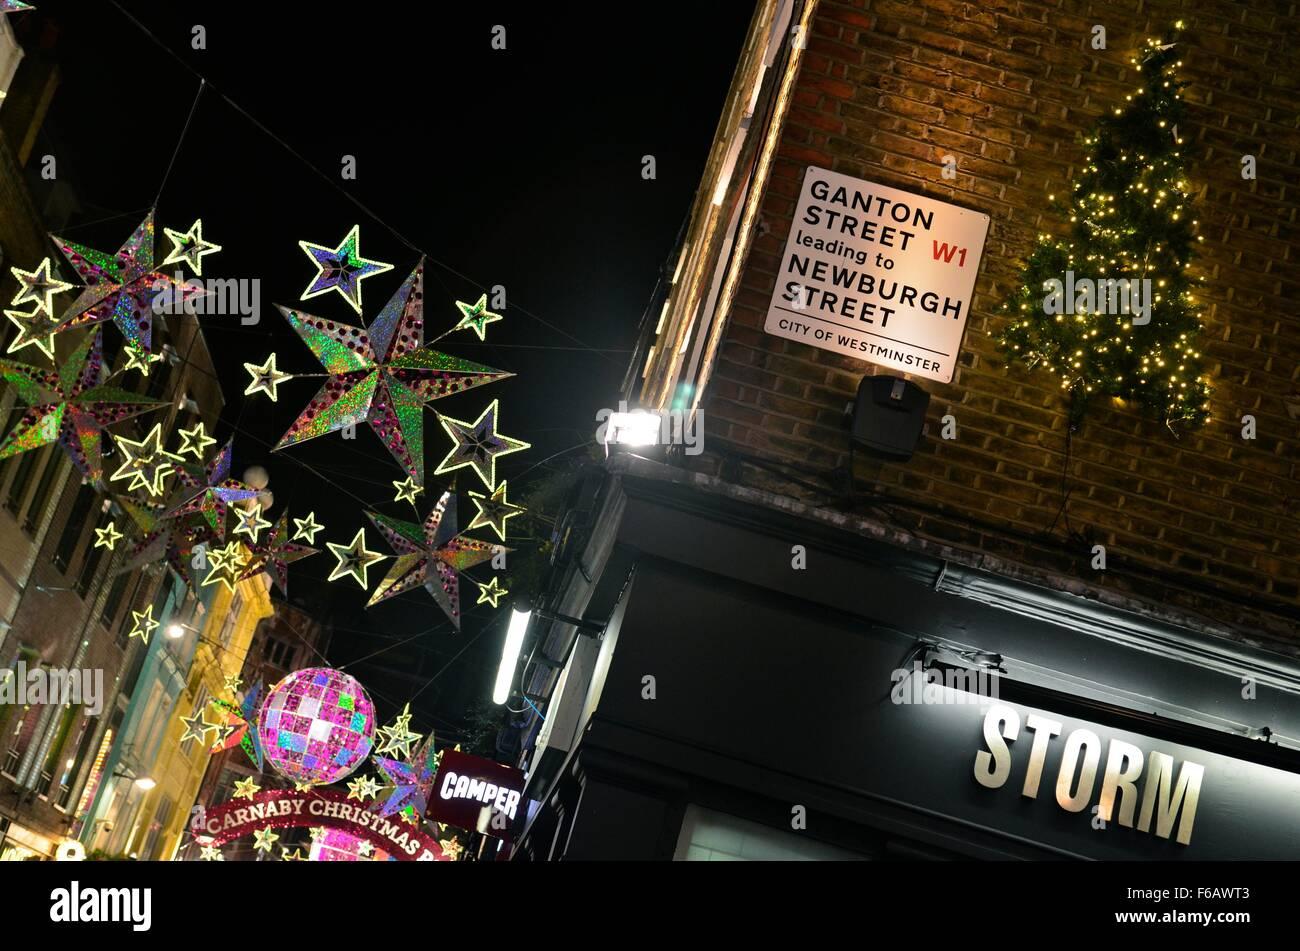 Christmas lights on Carnaby Street as seen from Ganton Street, London, England, UK - Stock Image